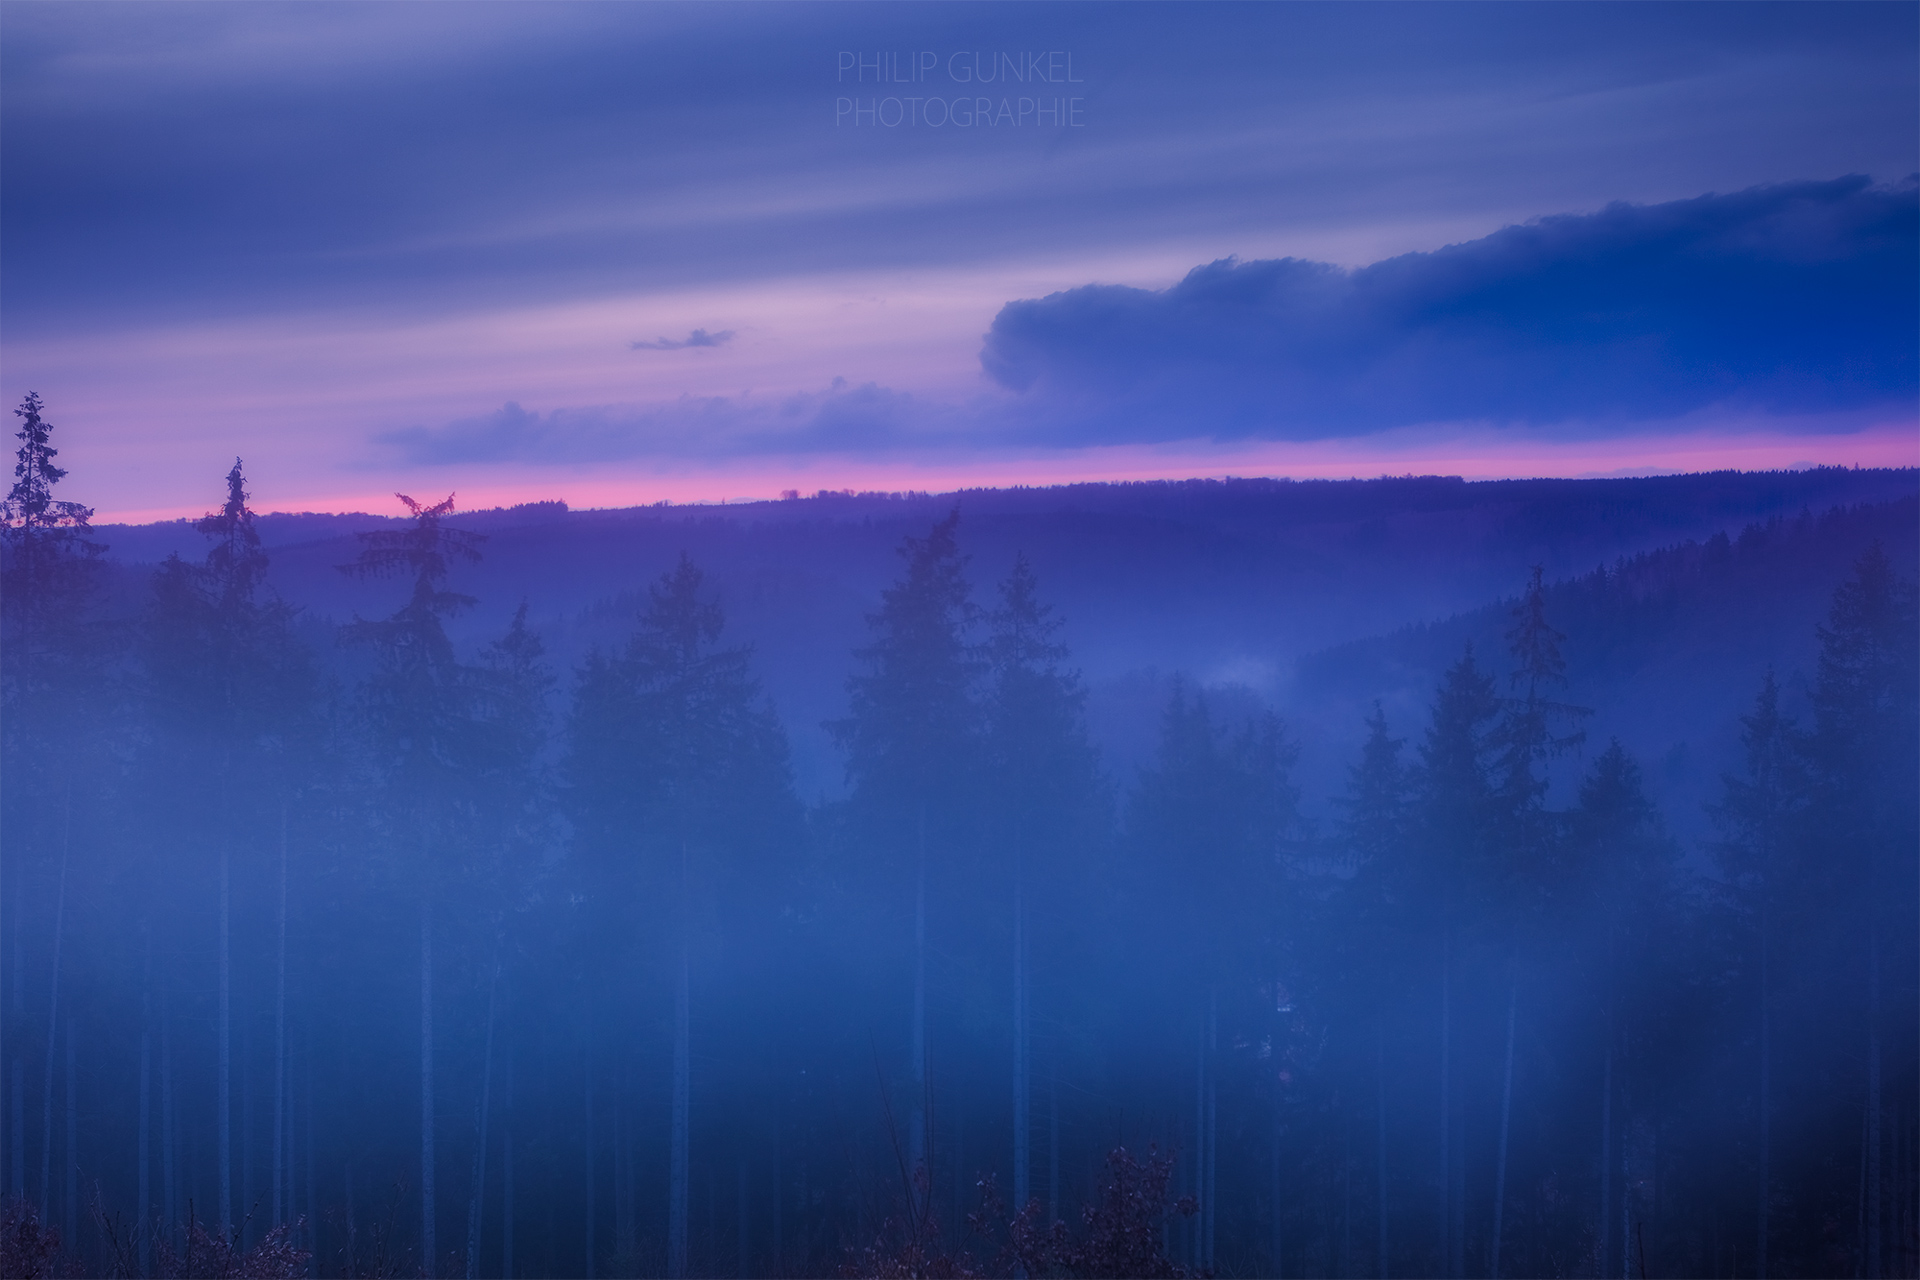 Harz, Bodetal_ Philip Gunkel